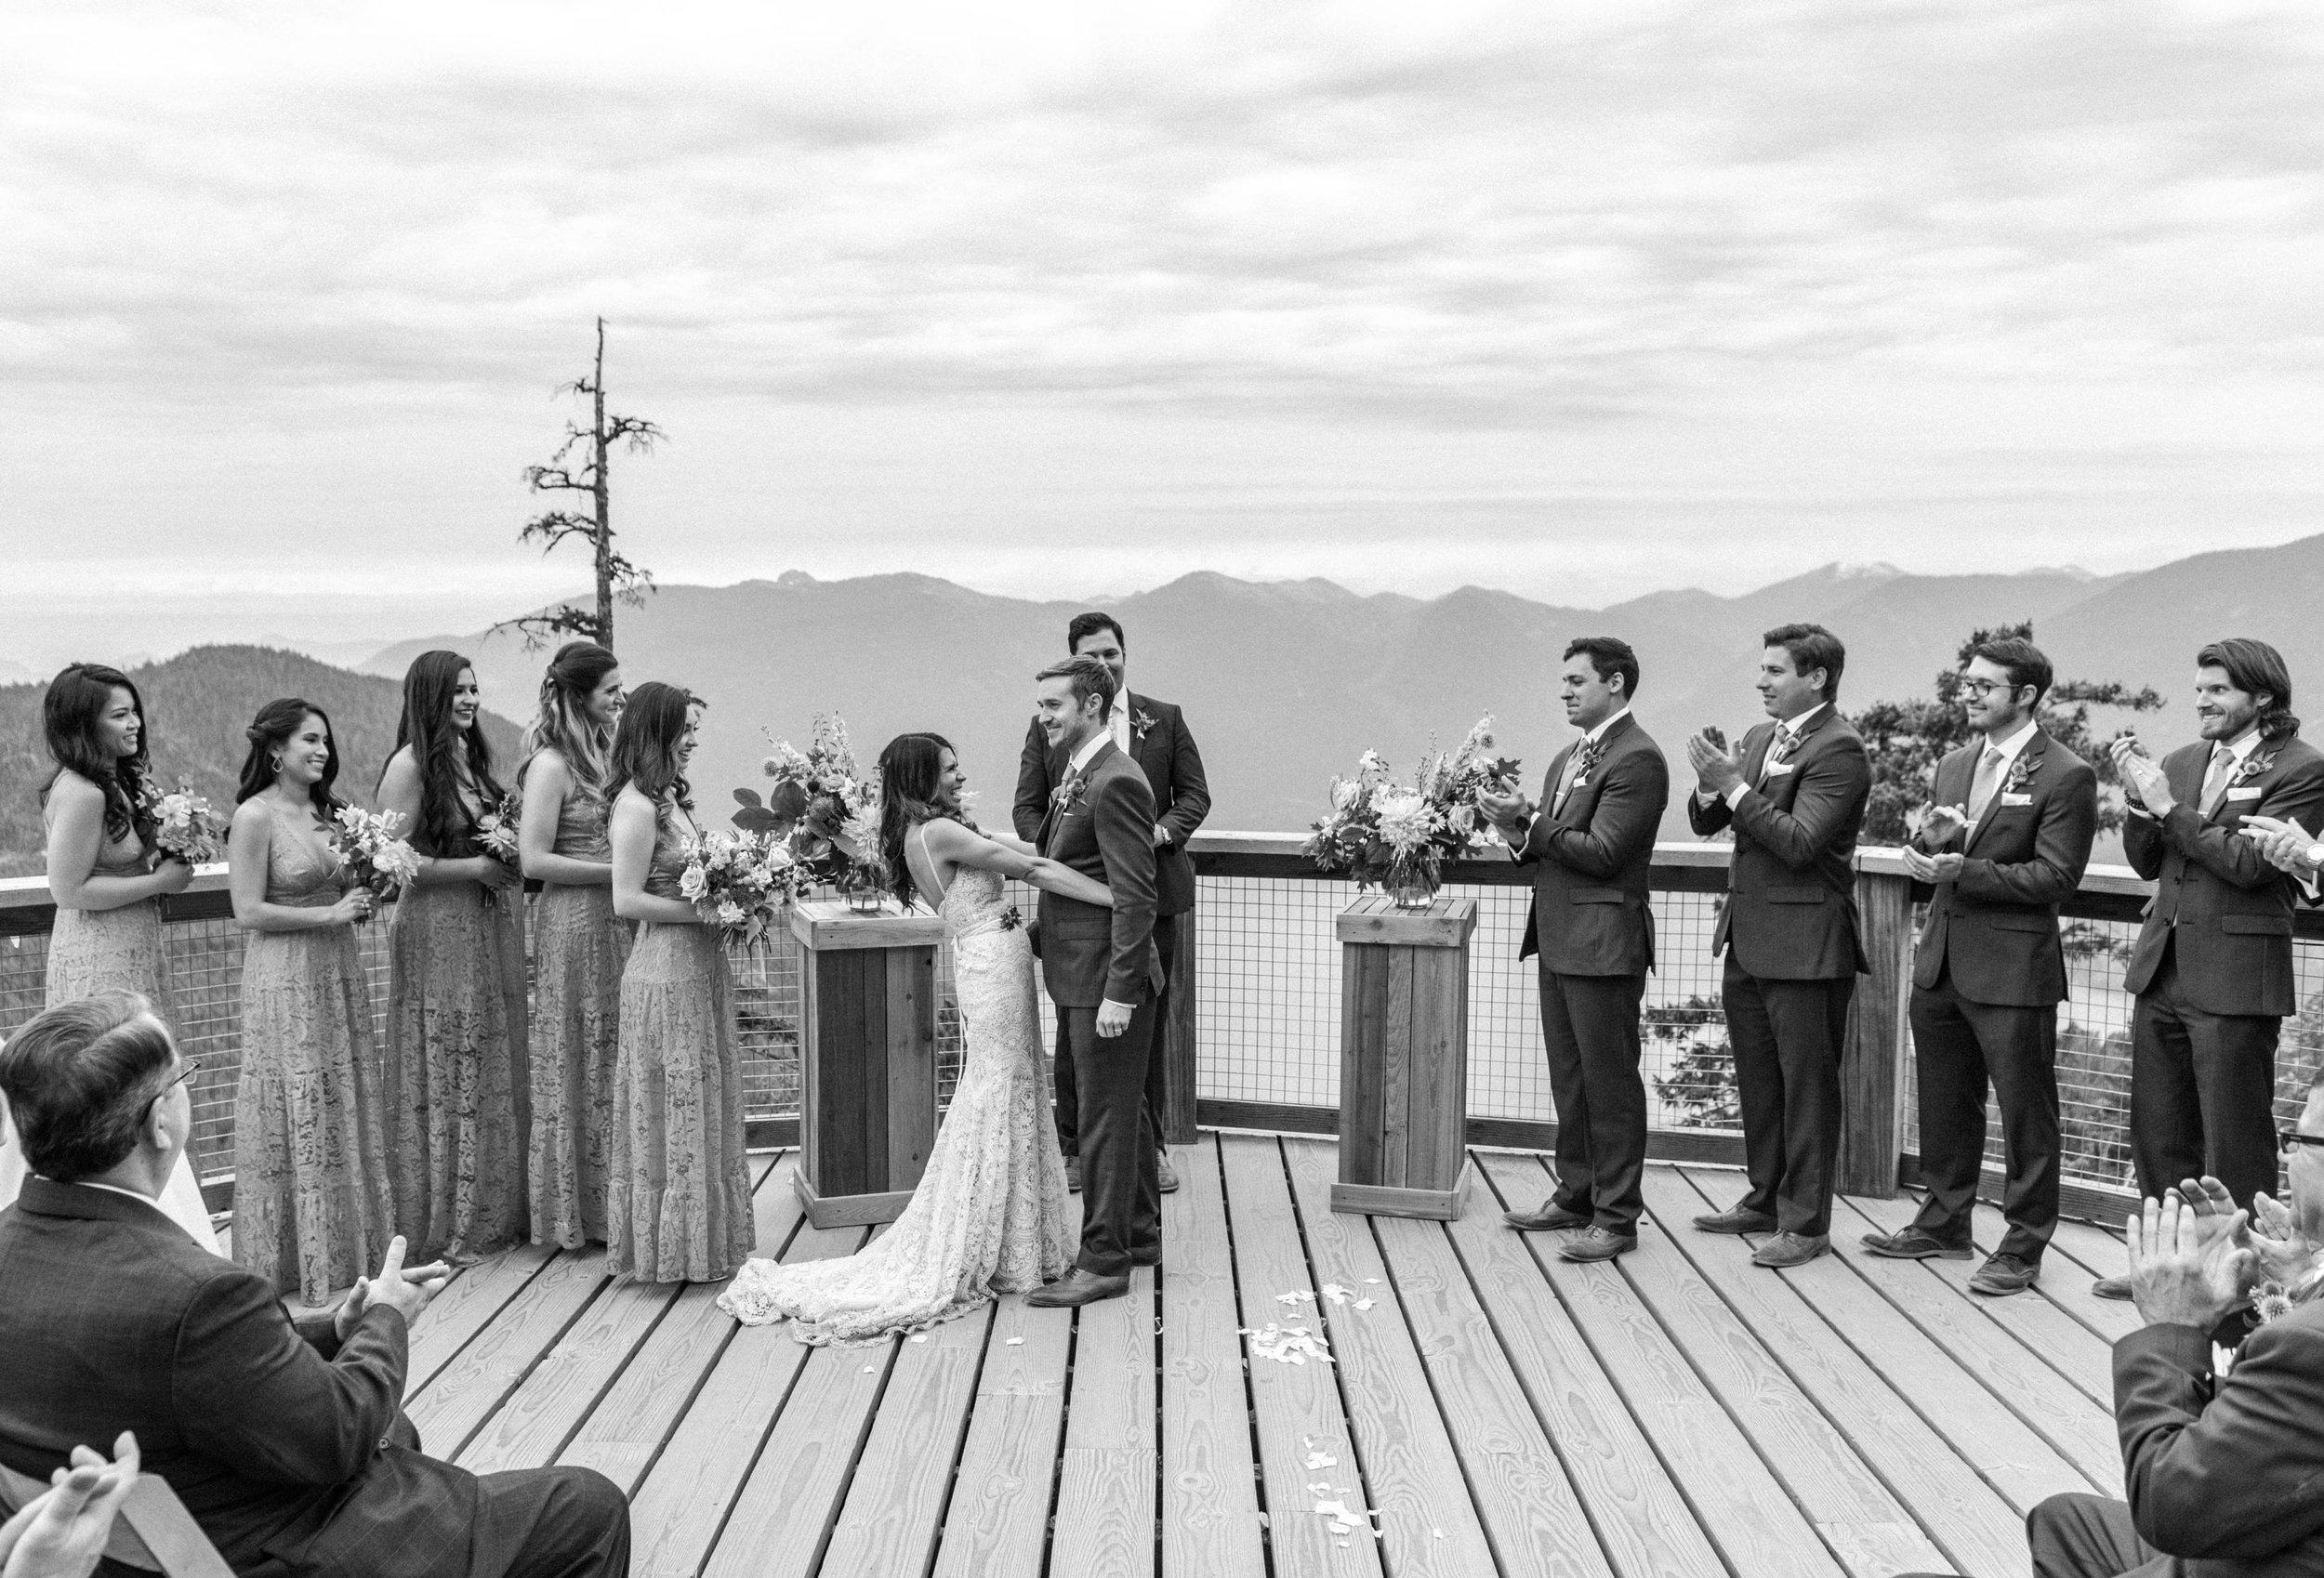 austin-texas-wedding-photography-1778-photographie-94.jpg